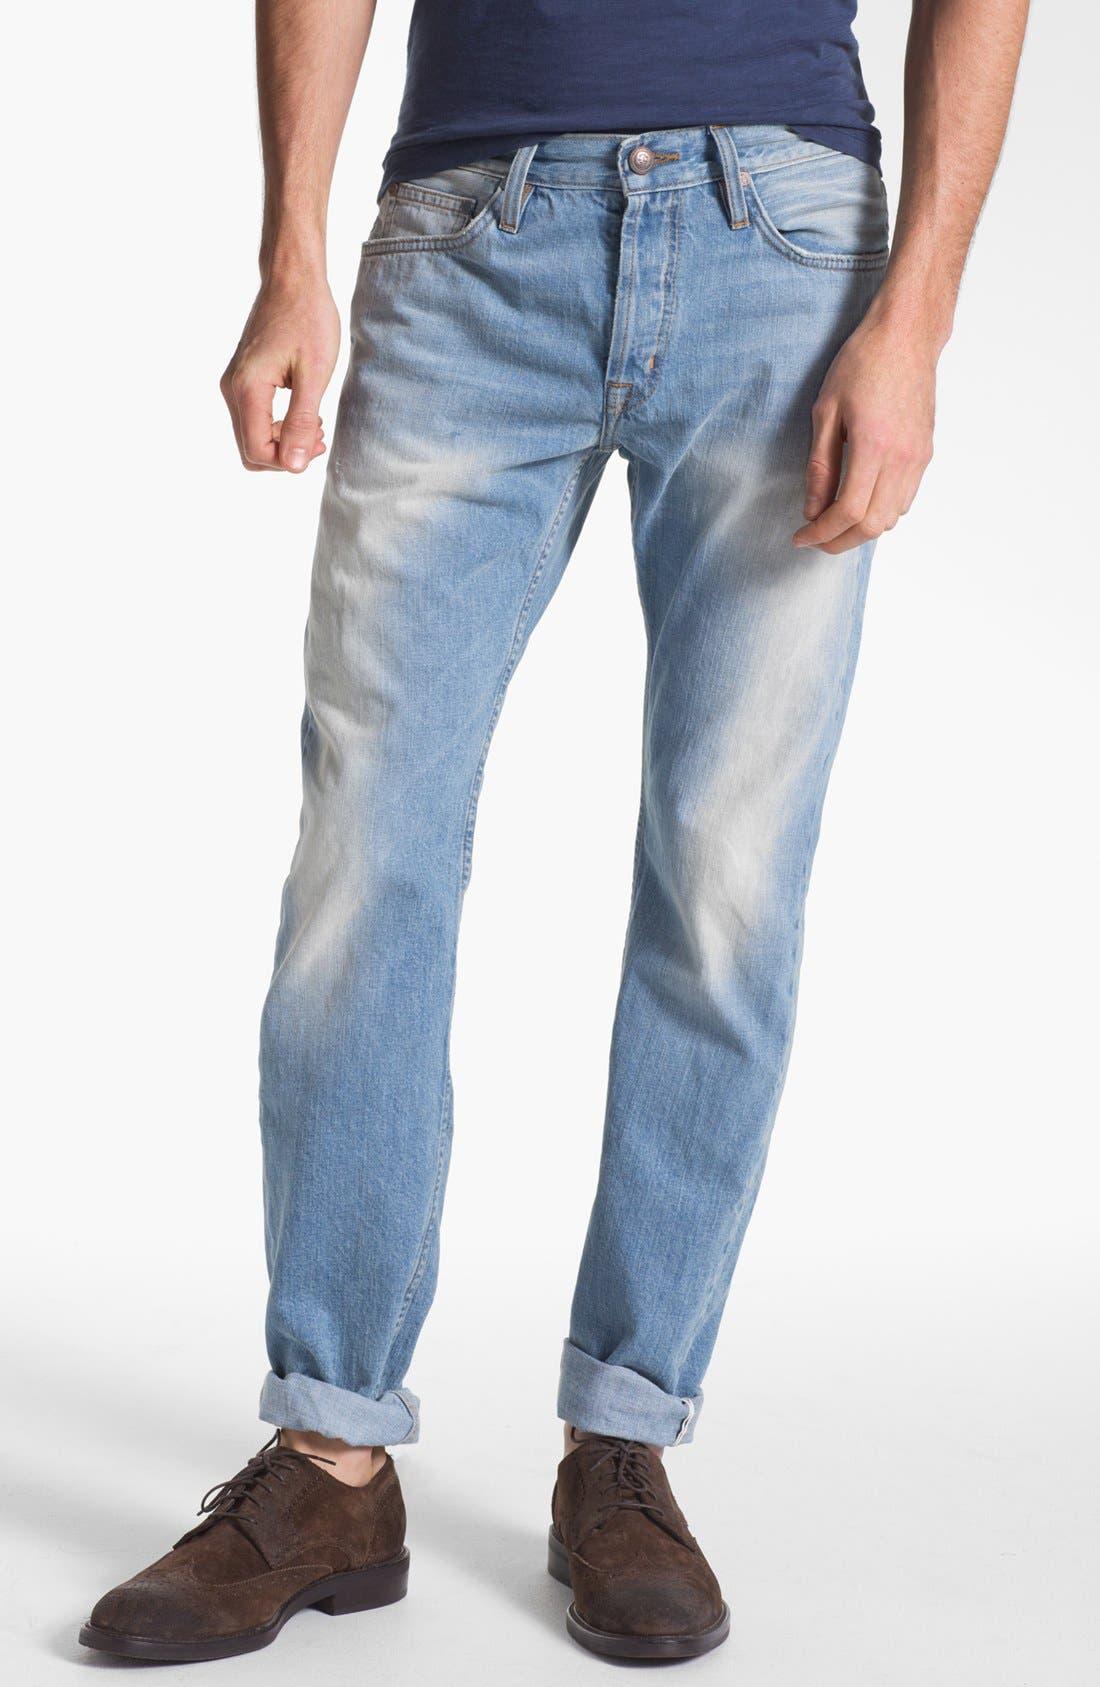 Main Image - Asbury Park '1874 Monte Carlo' Straight Leg Selvedge Jeans (Paramount)